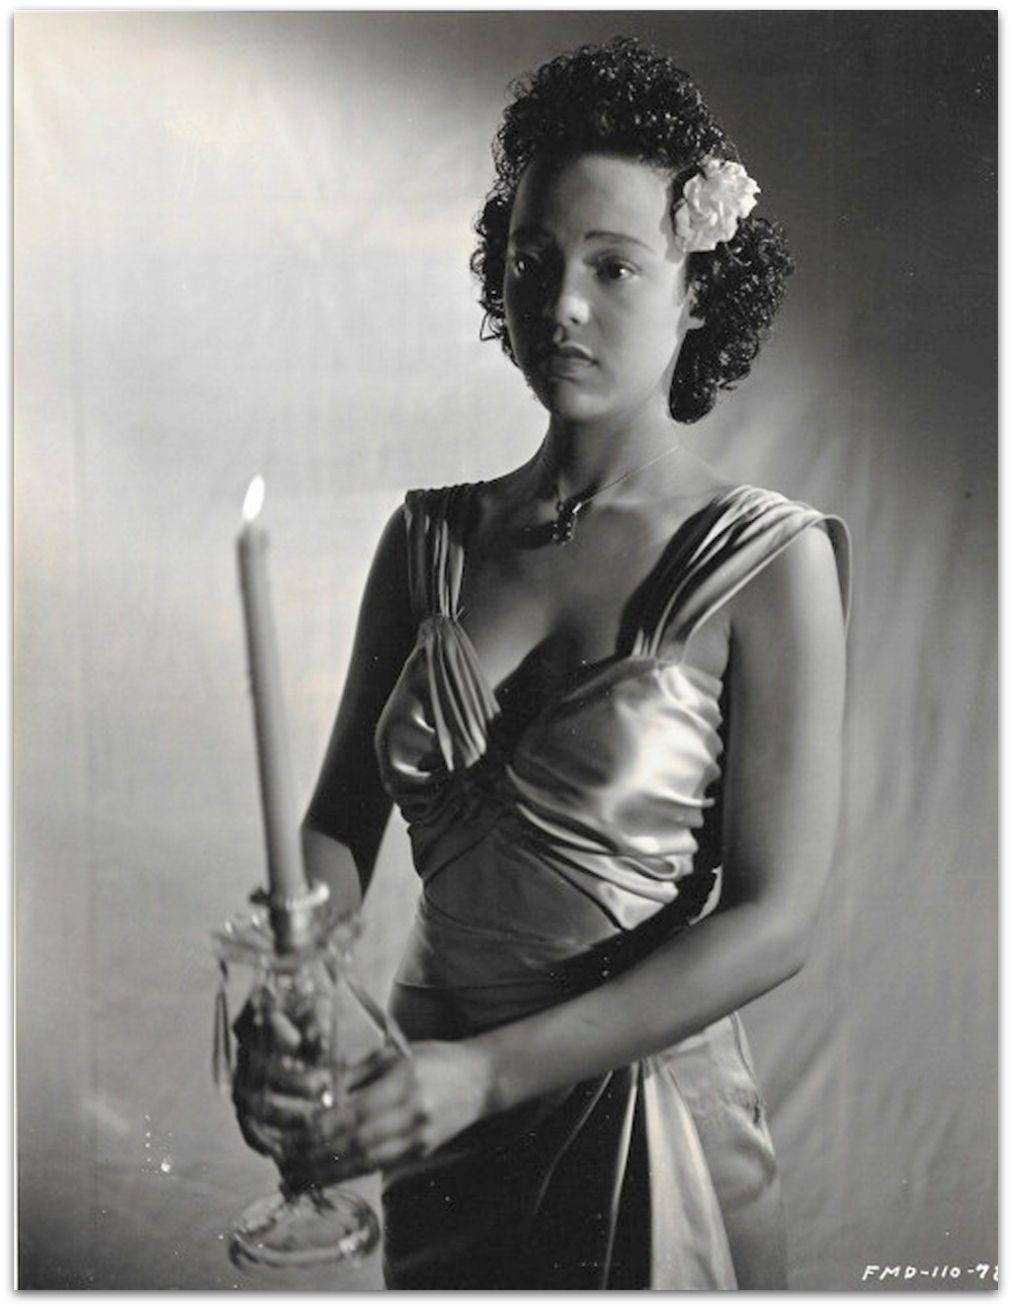 Fiona Hendley,Elaine Smith (actress) Sex pic Ambra Gutierrez ITA,Tulip Joshi